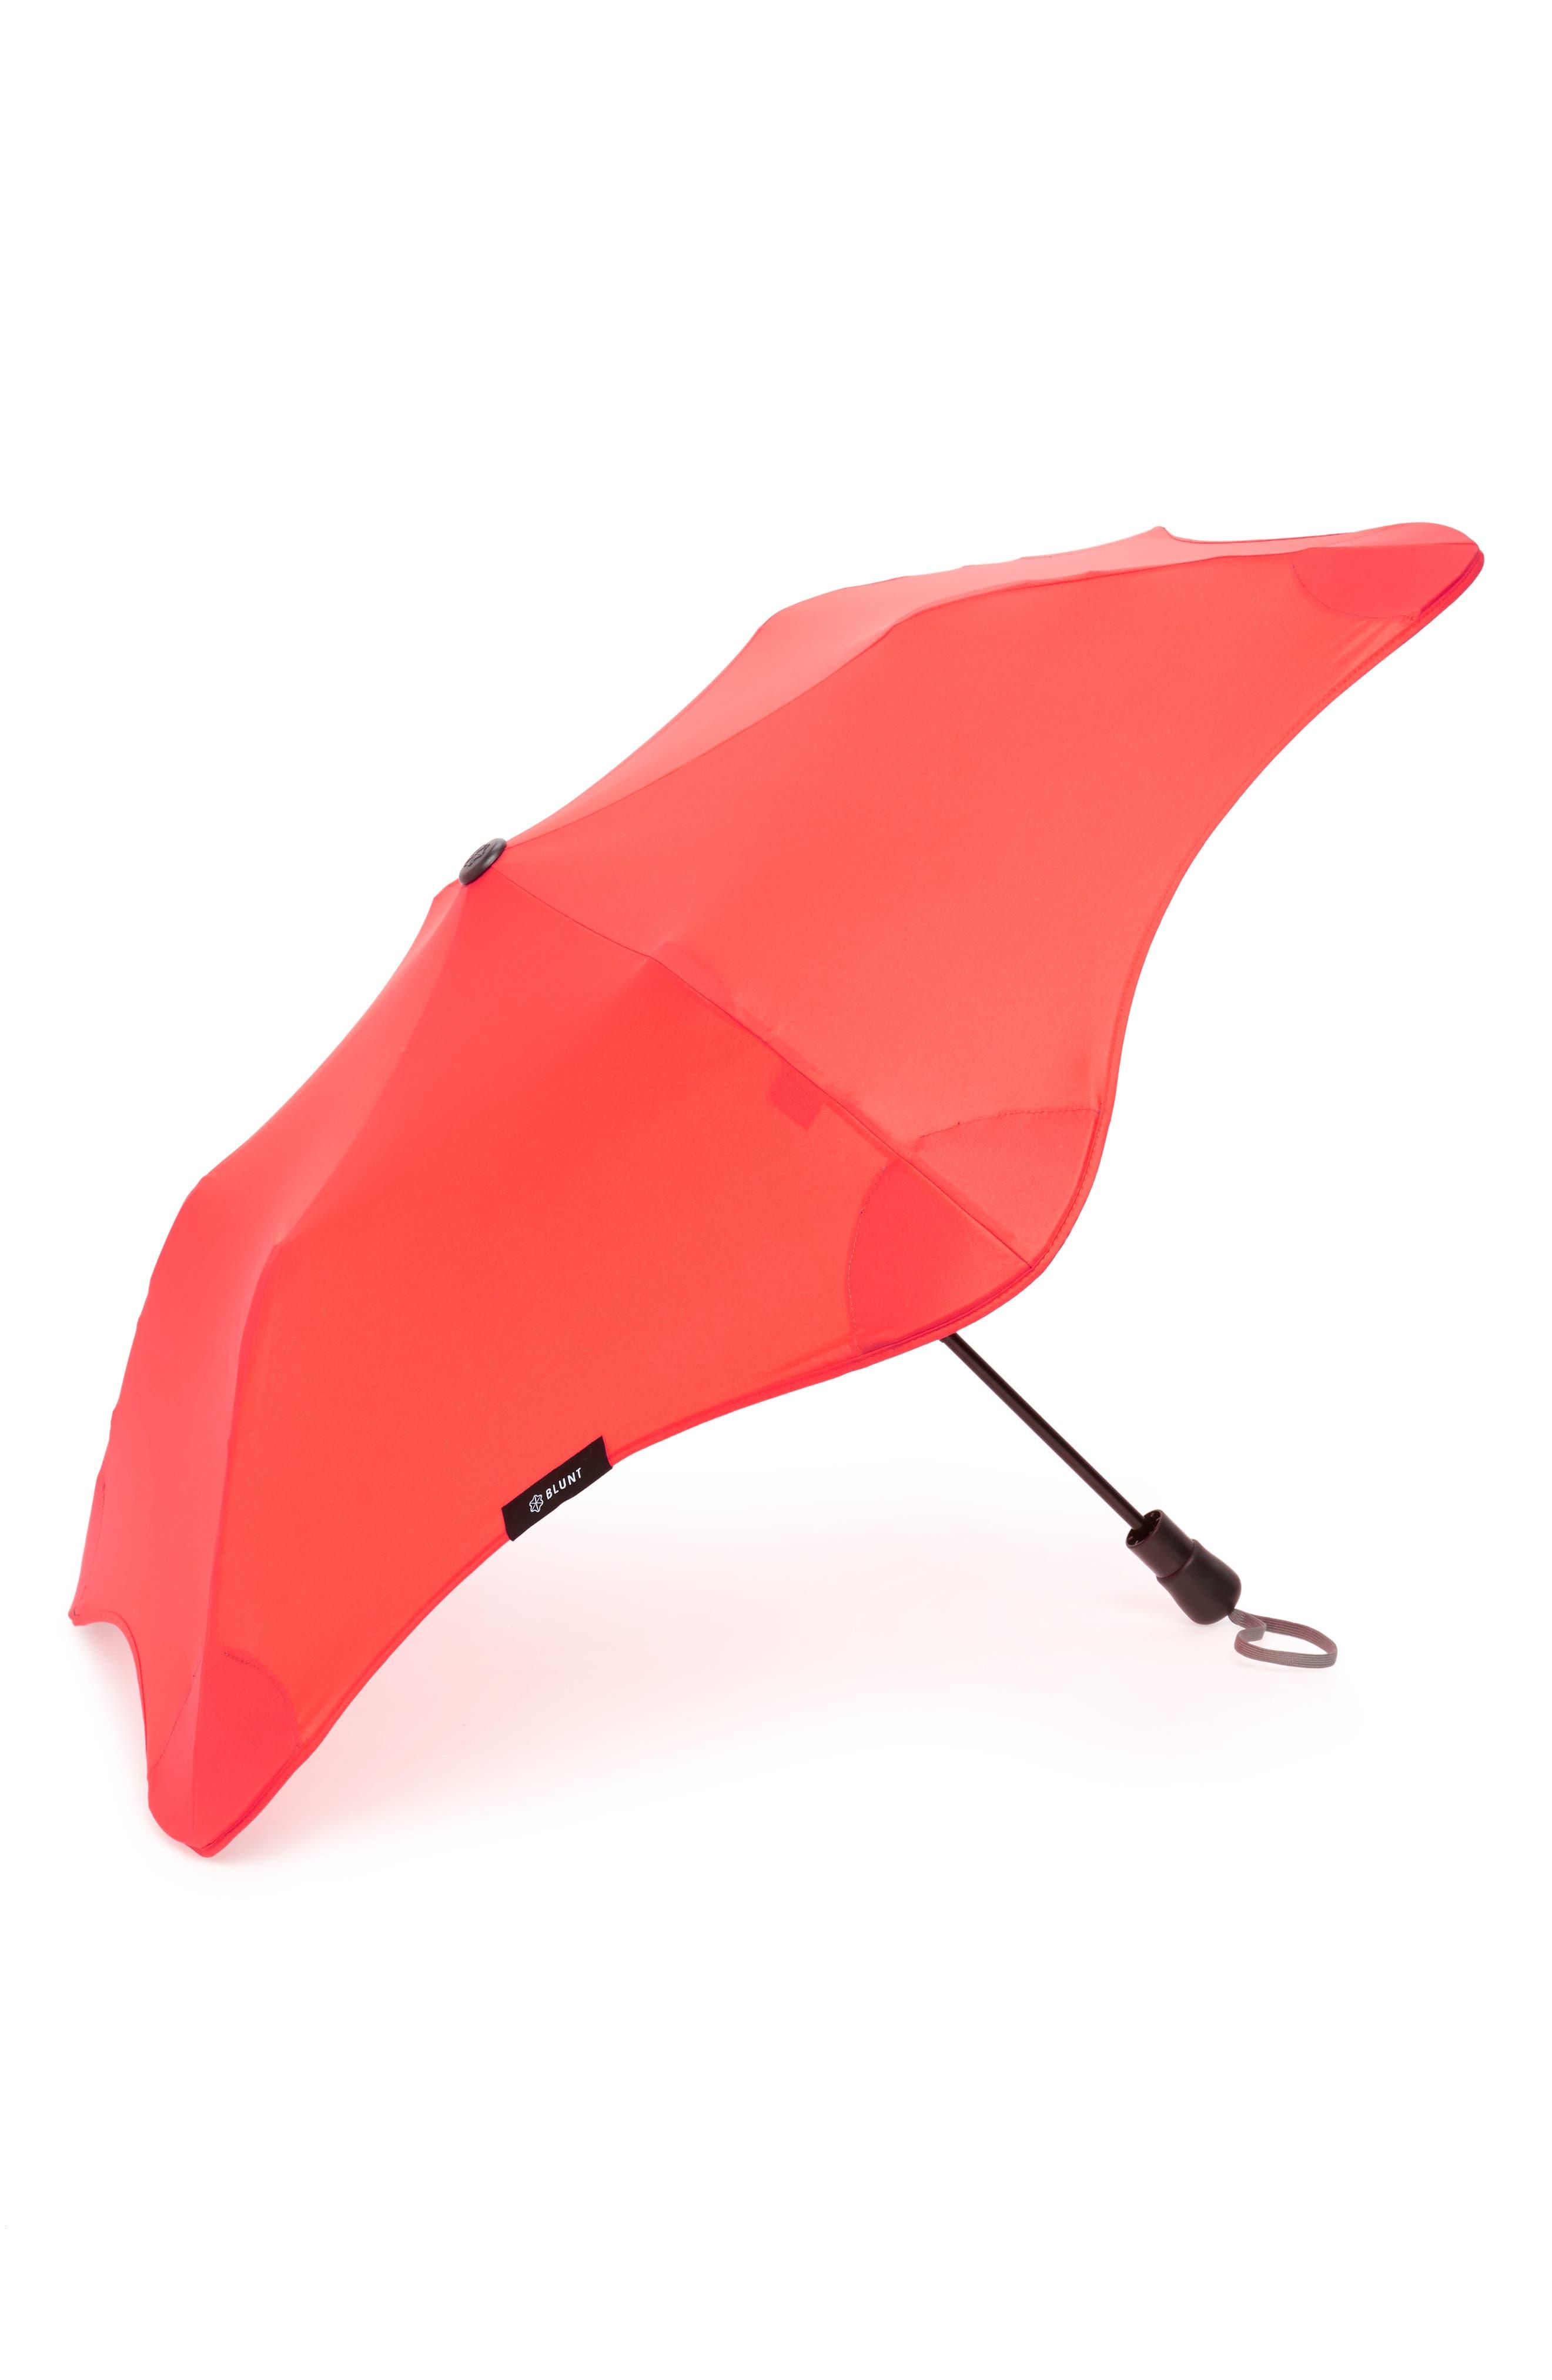 Alternate Image 1 Selected - Blunt Metro Umbrella